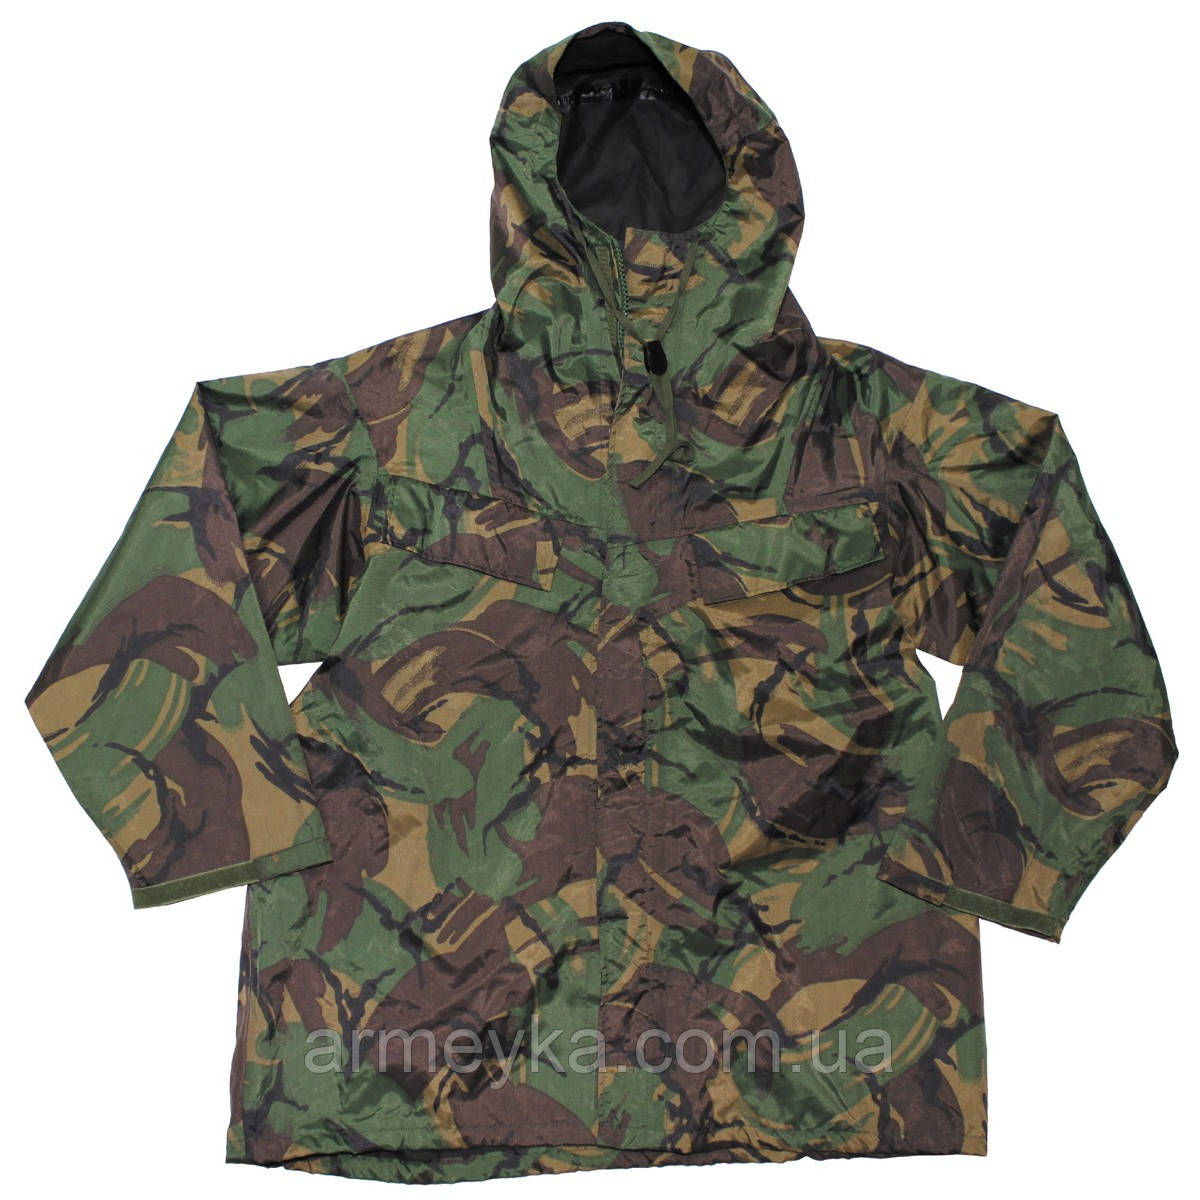 Водонепроницаемая (waterproof) куртка DPM. ВС Великобритании, оригинал.